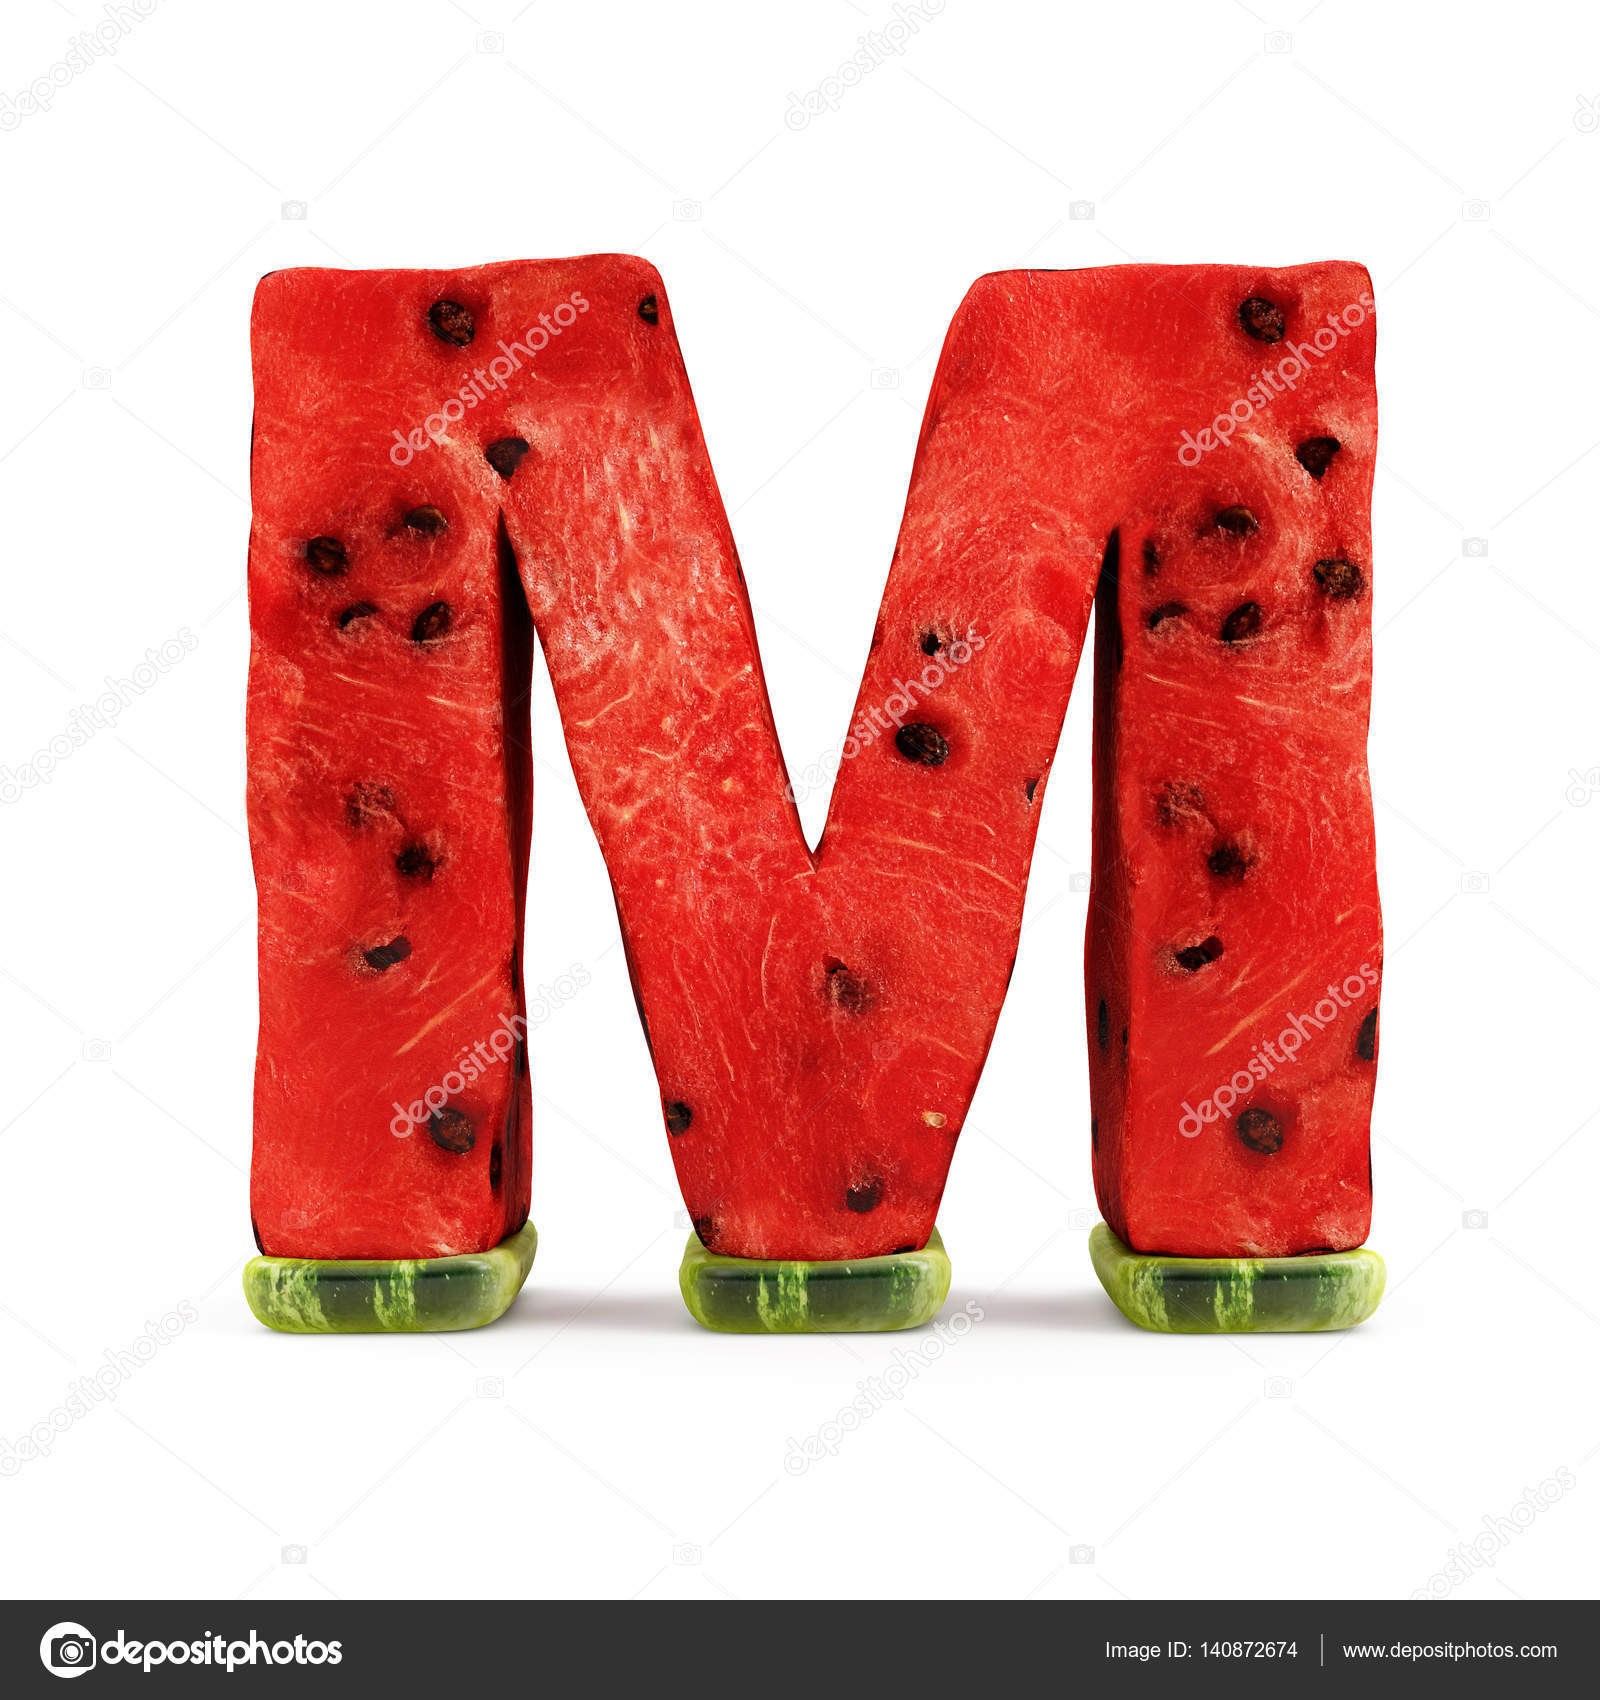 Watermelon alphabet letter m stock photo ras slava 140872674 watermelon alphabet letter m stock photo altavistaventures Gallery